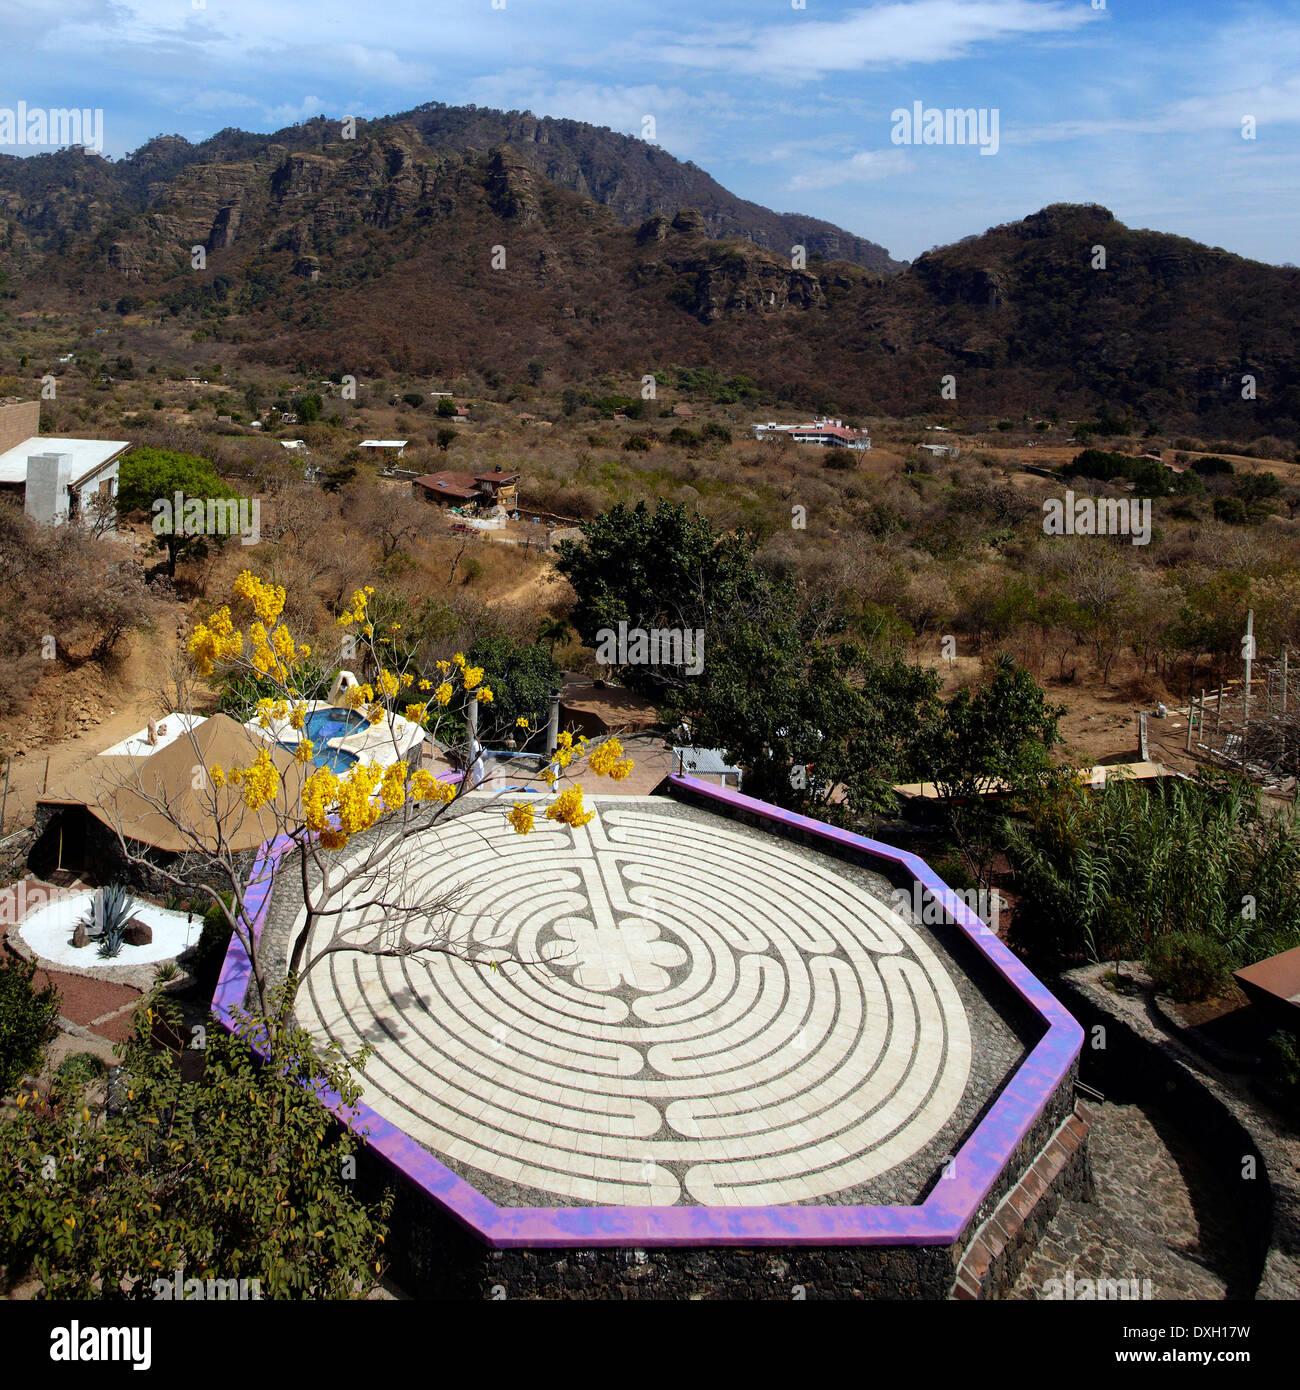 América, Mexico, Morelos state, Amatlán village, hostal de la luz, copy of the Chartres labyrinth built over a octogonal pyramid - Stock Image